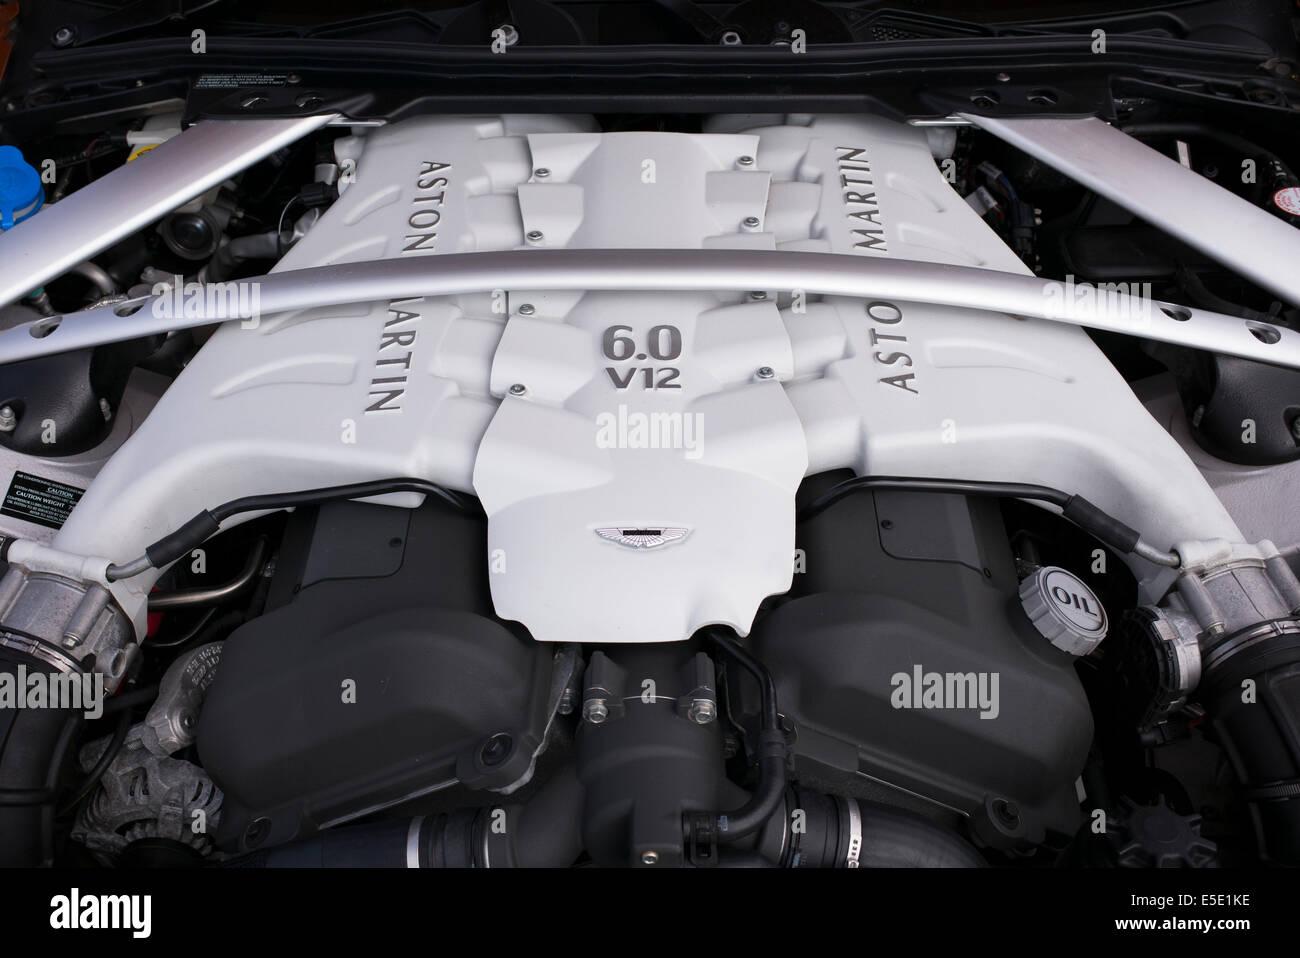 Aston Martin Vantage 6 Litre V12 Engine Stock Photo Alamy